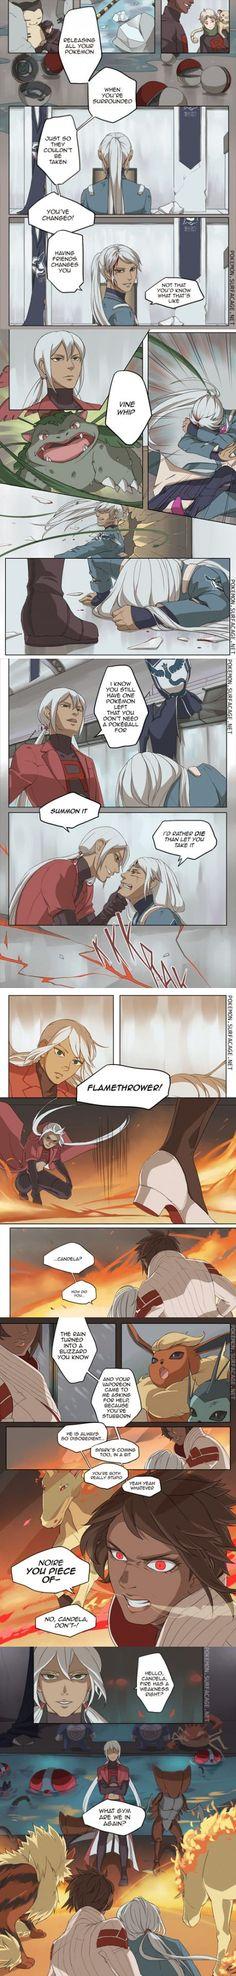 Blanche vs Noire (Blanche's Twin : Team Rocket Leader)